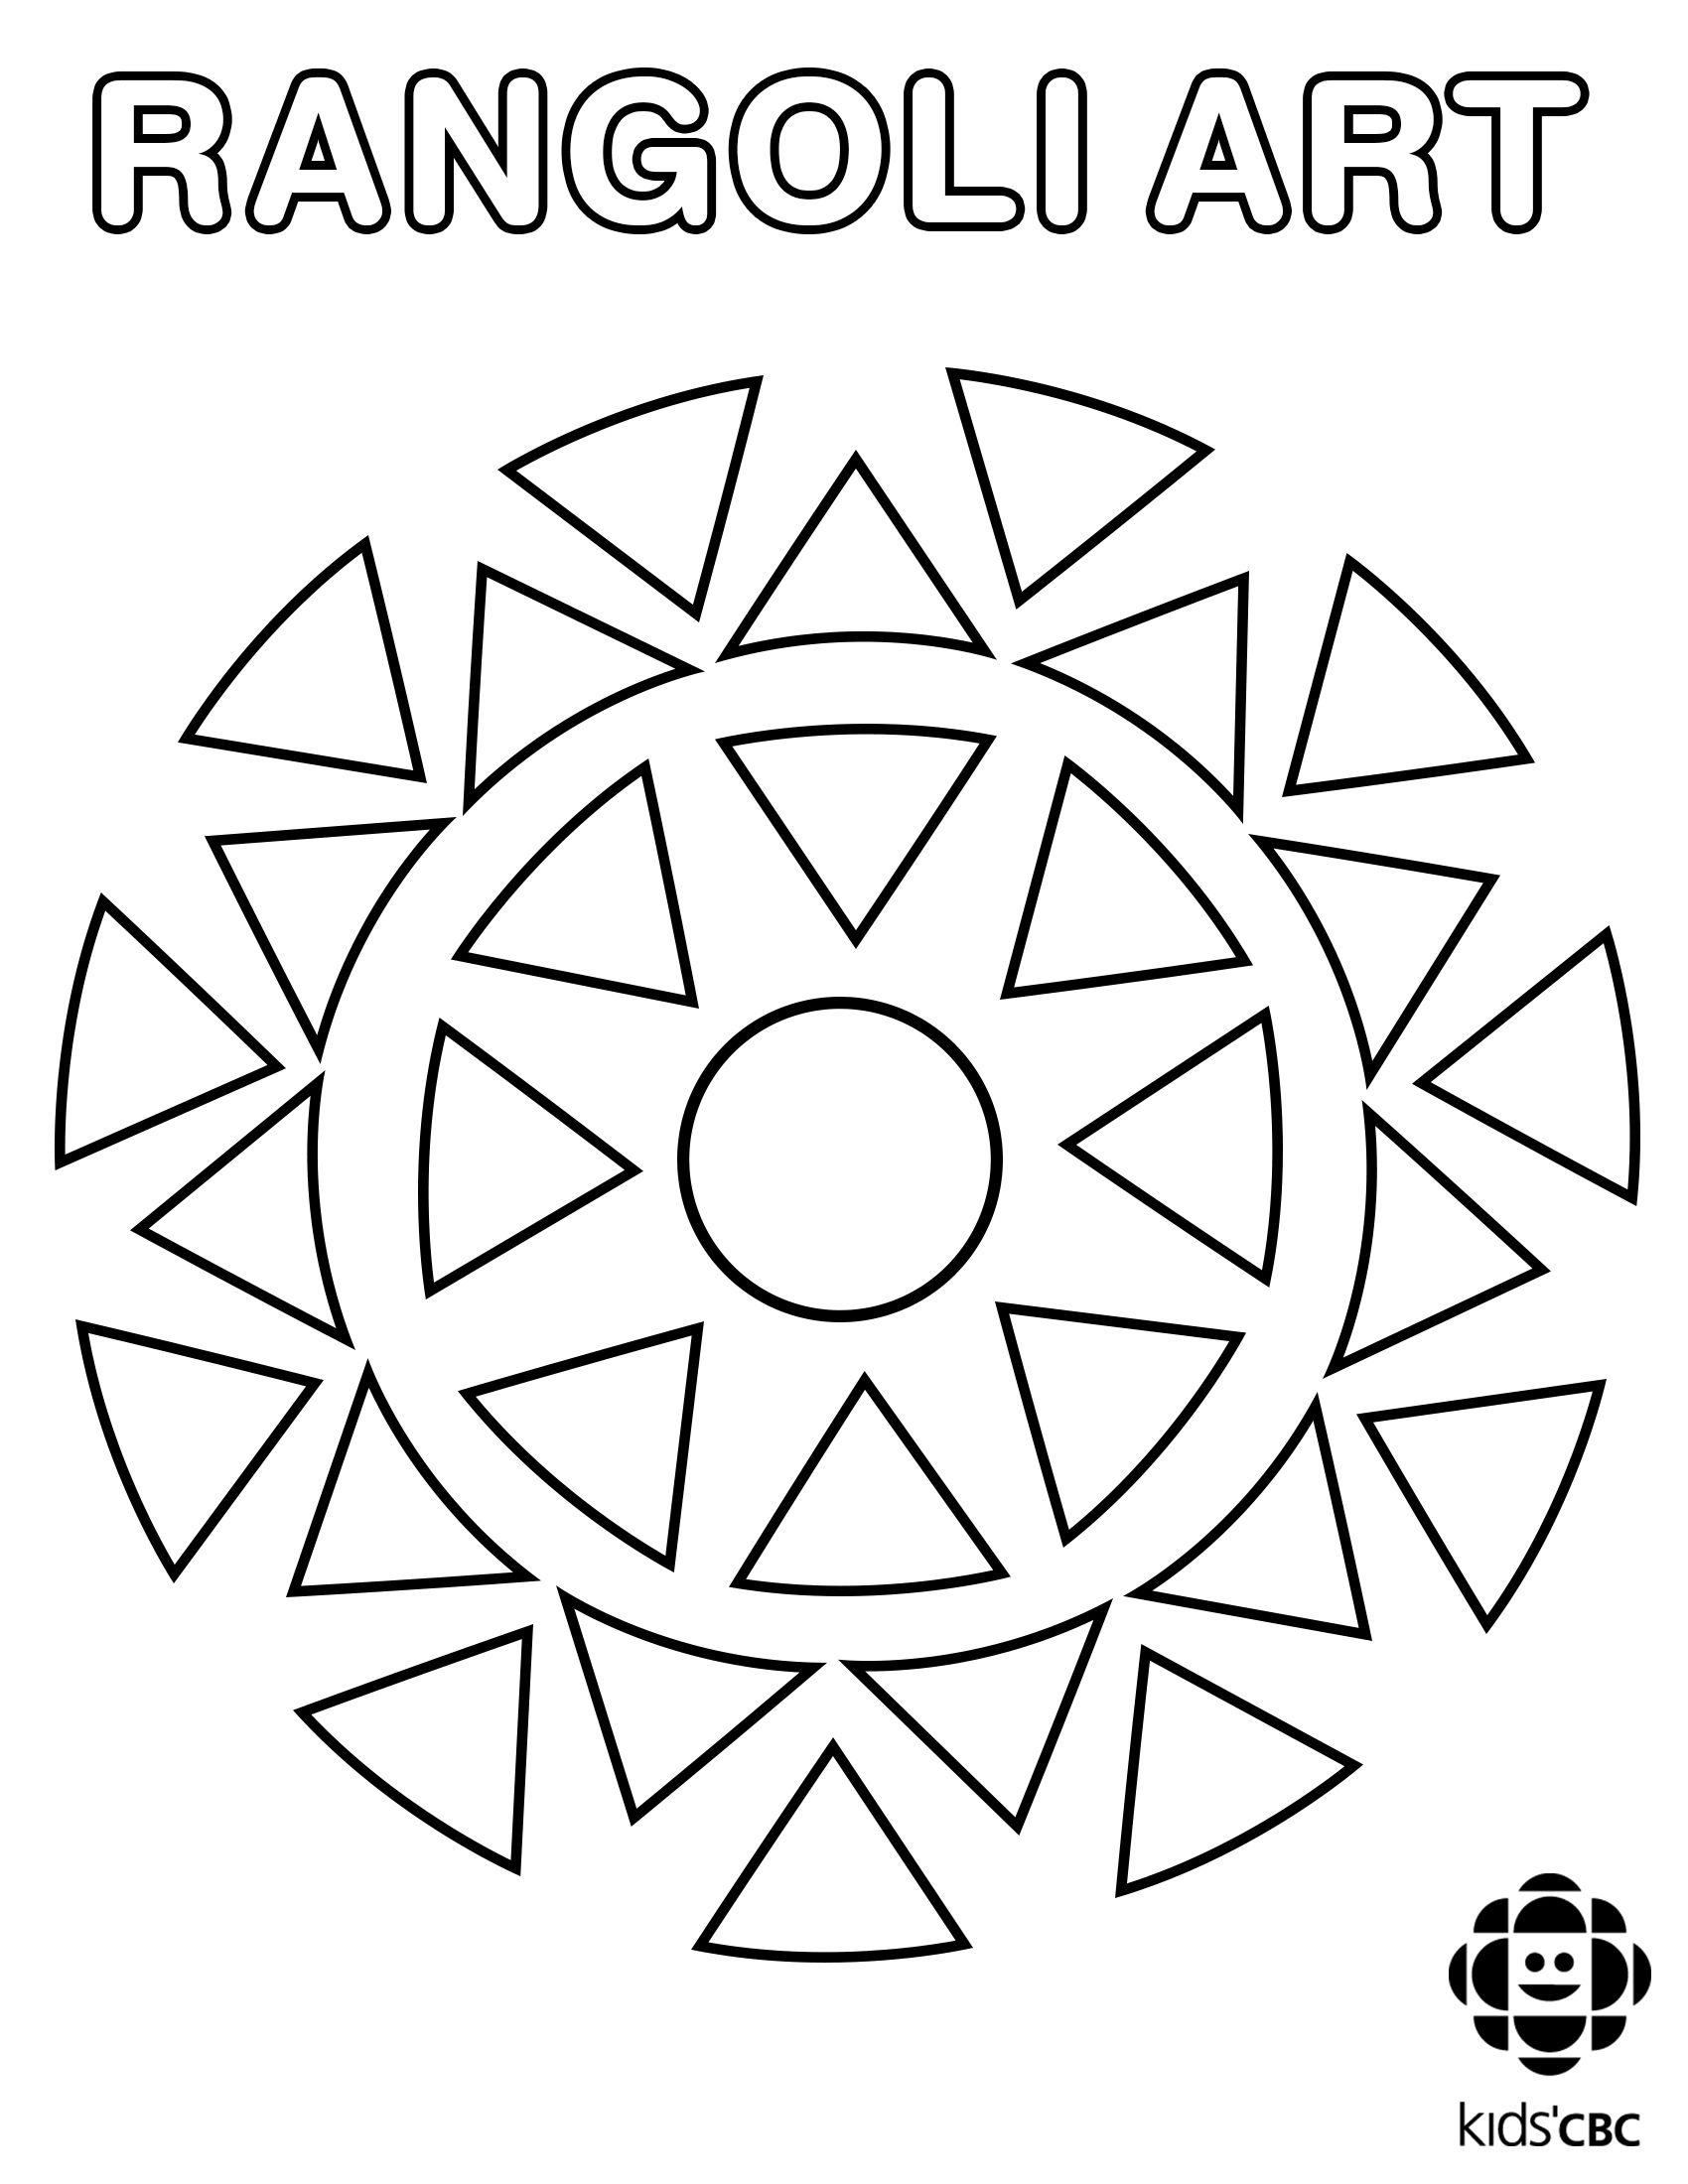 Image result for rangoli patterns black and white | Rangoli design ...